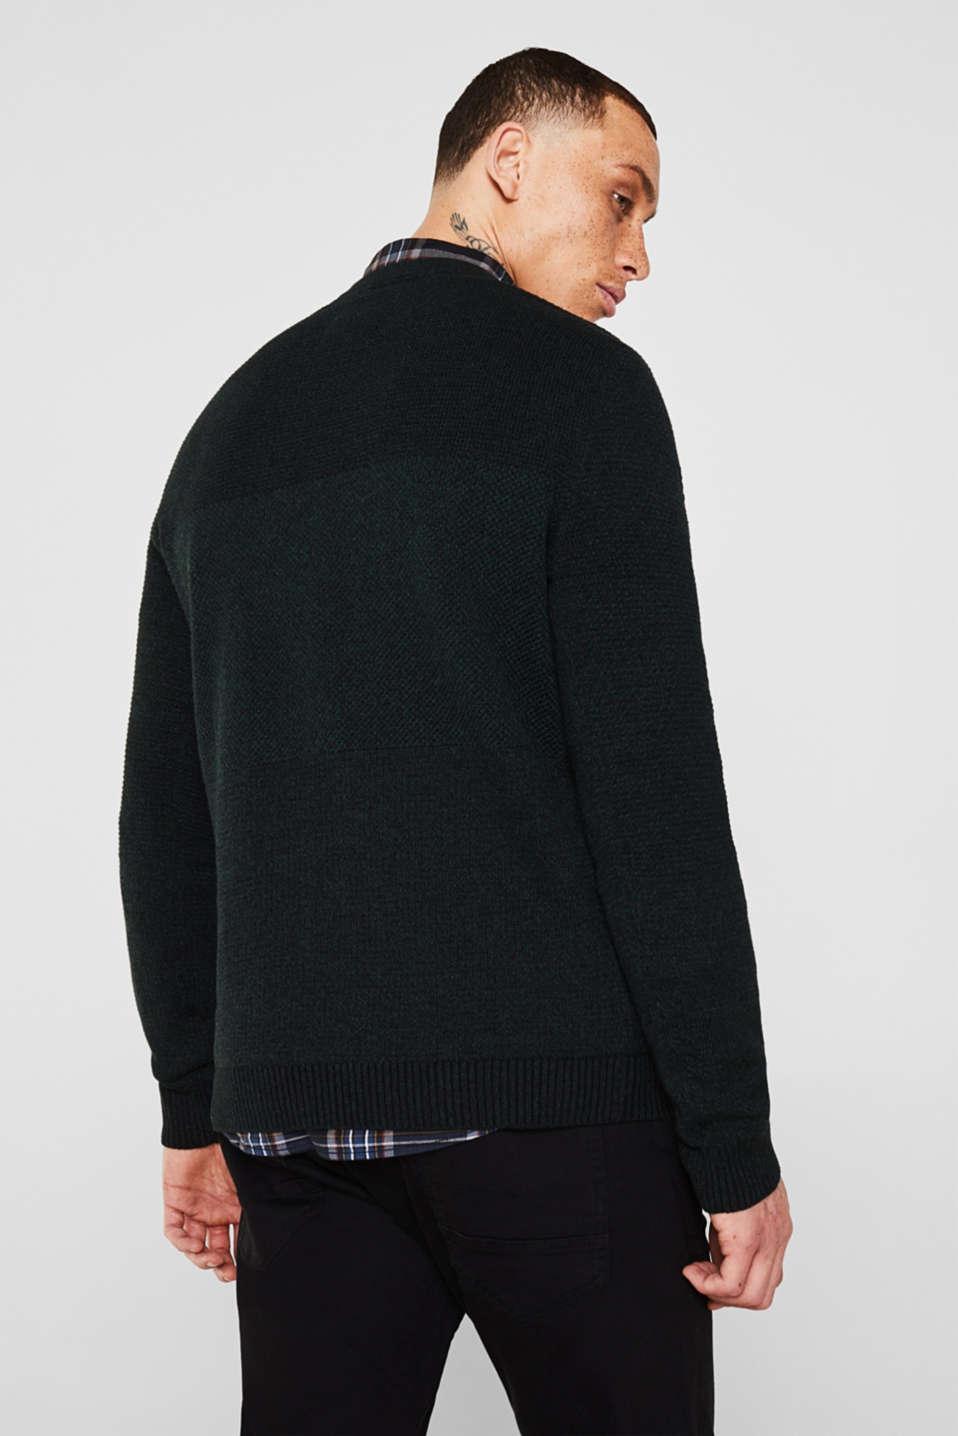 Jumper with textured stripes, 100% cotton, DARK GREEN, detail image number 3